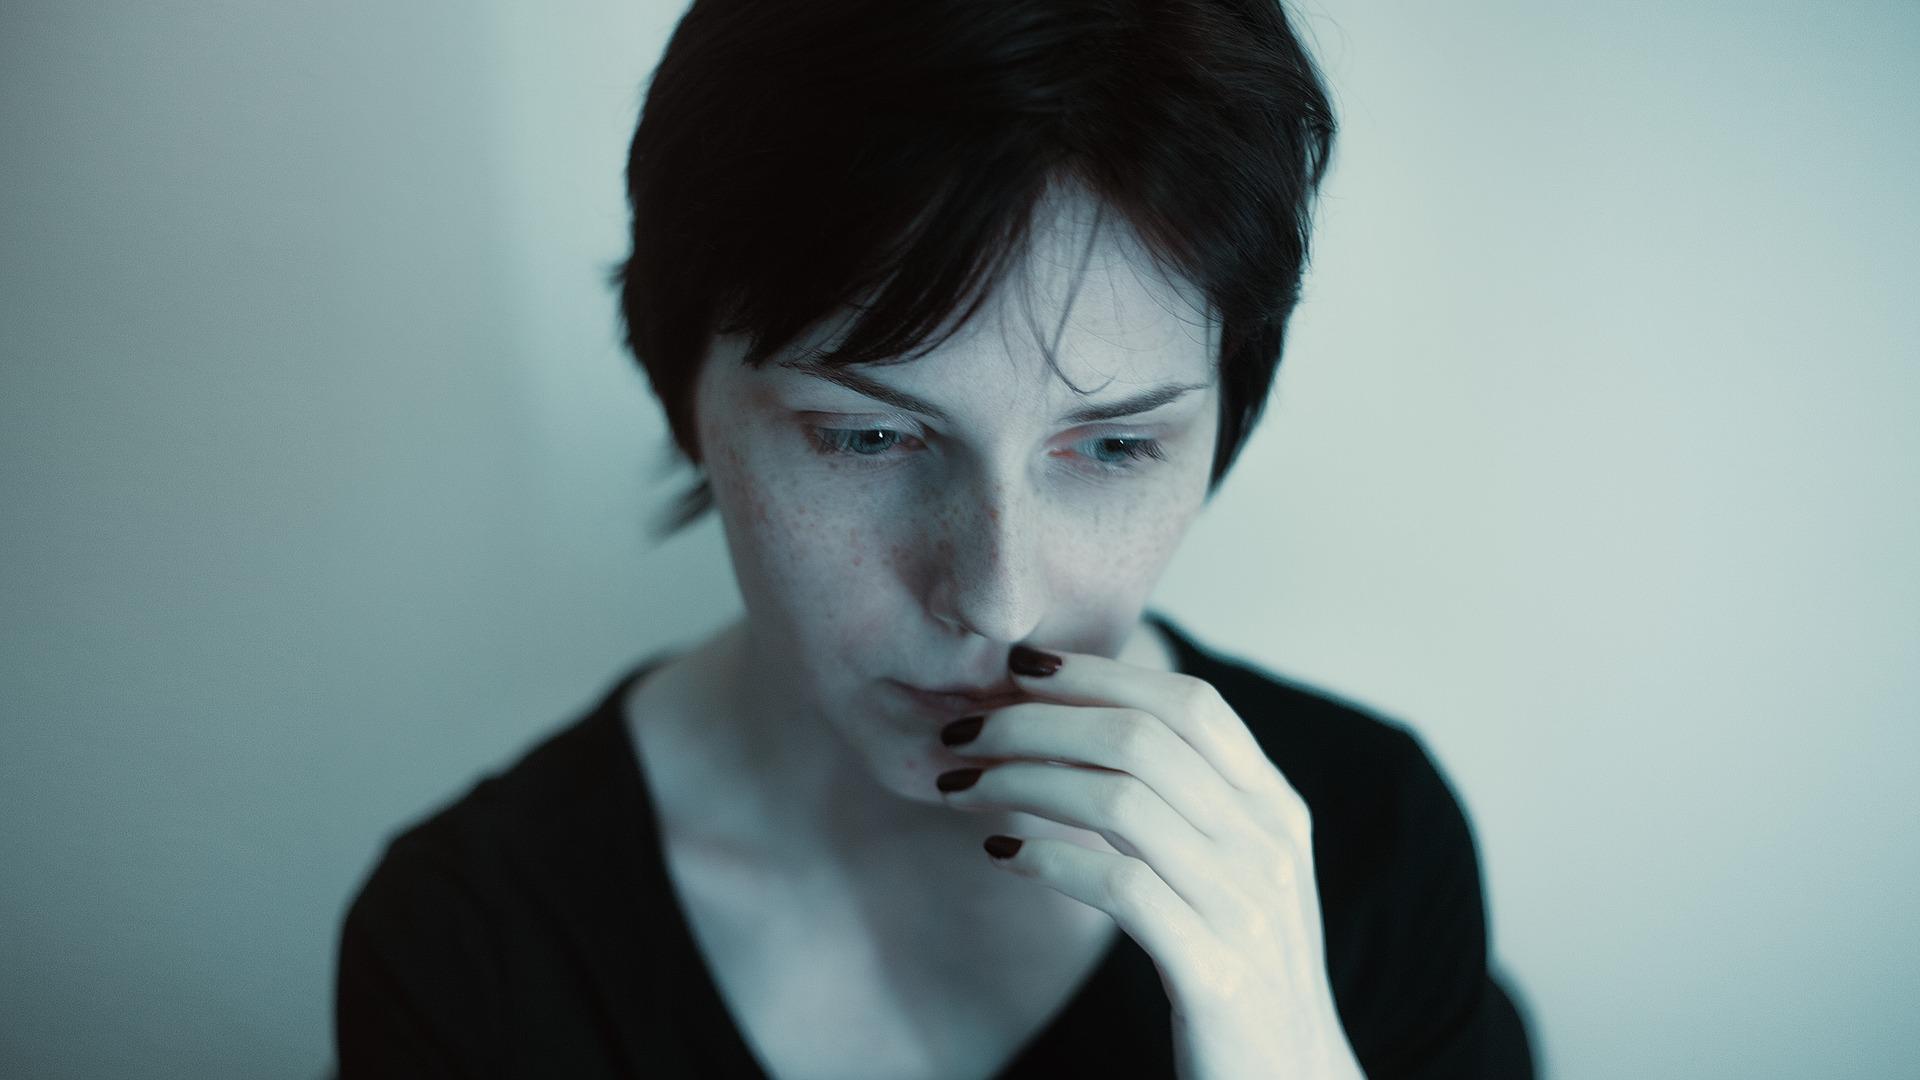 stress-anxiety-counselling-kelowna-bc.jpg